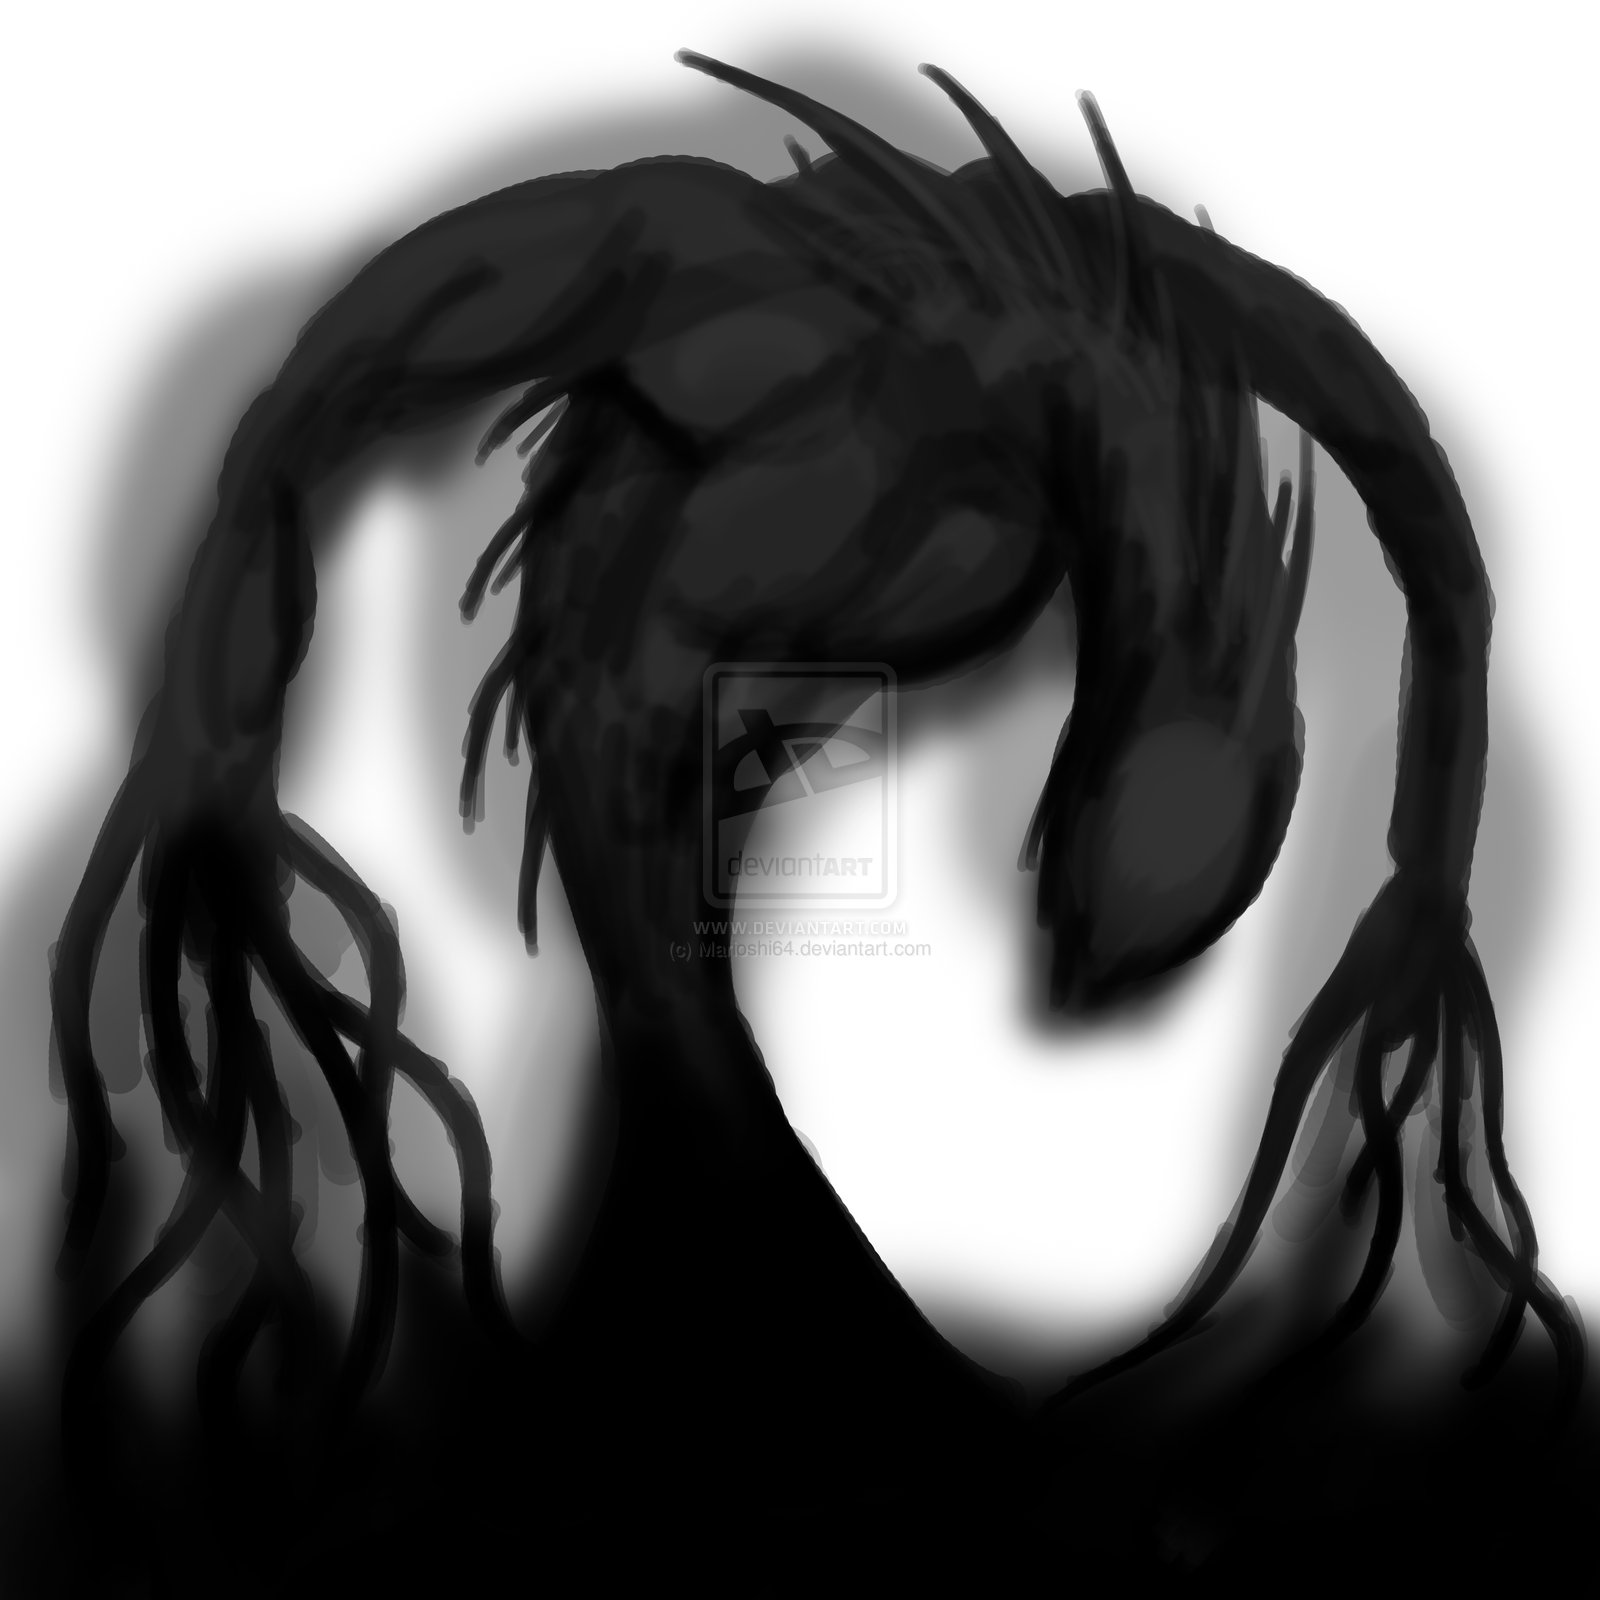 Image Shadow Monster Jpg Role Play Wiki Fandom Powered By Wikia